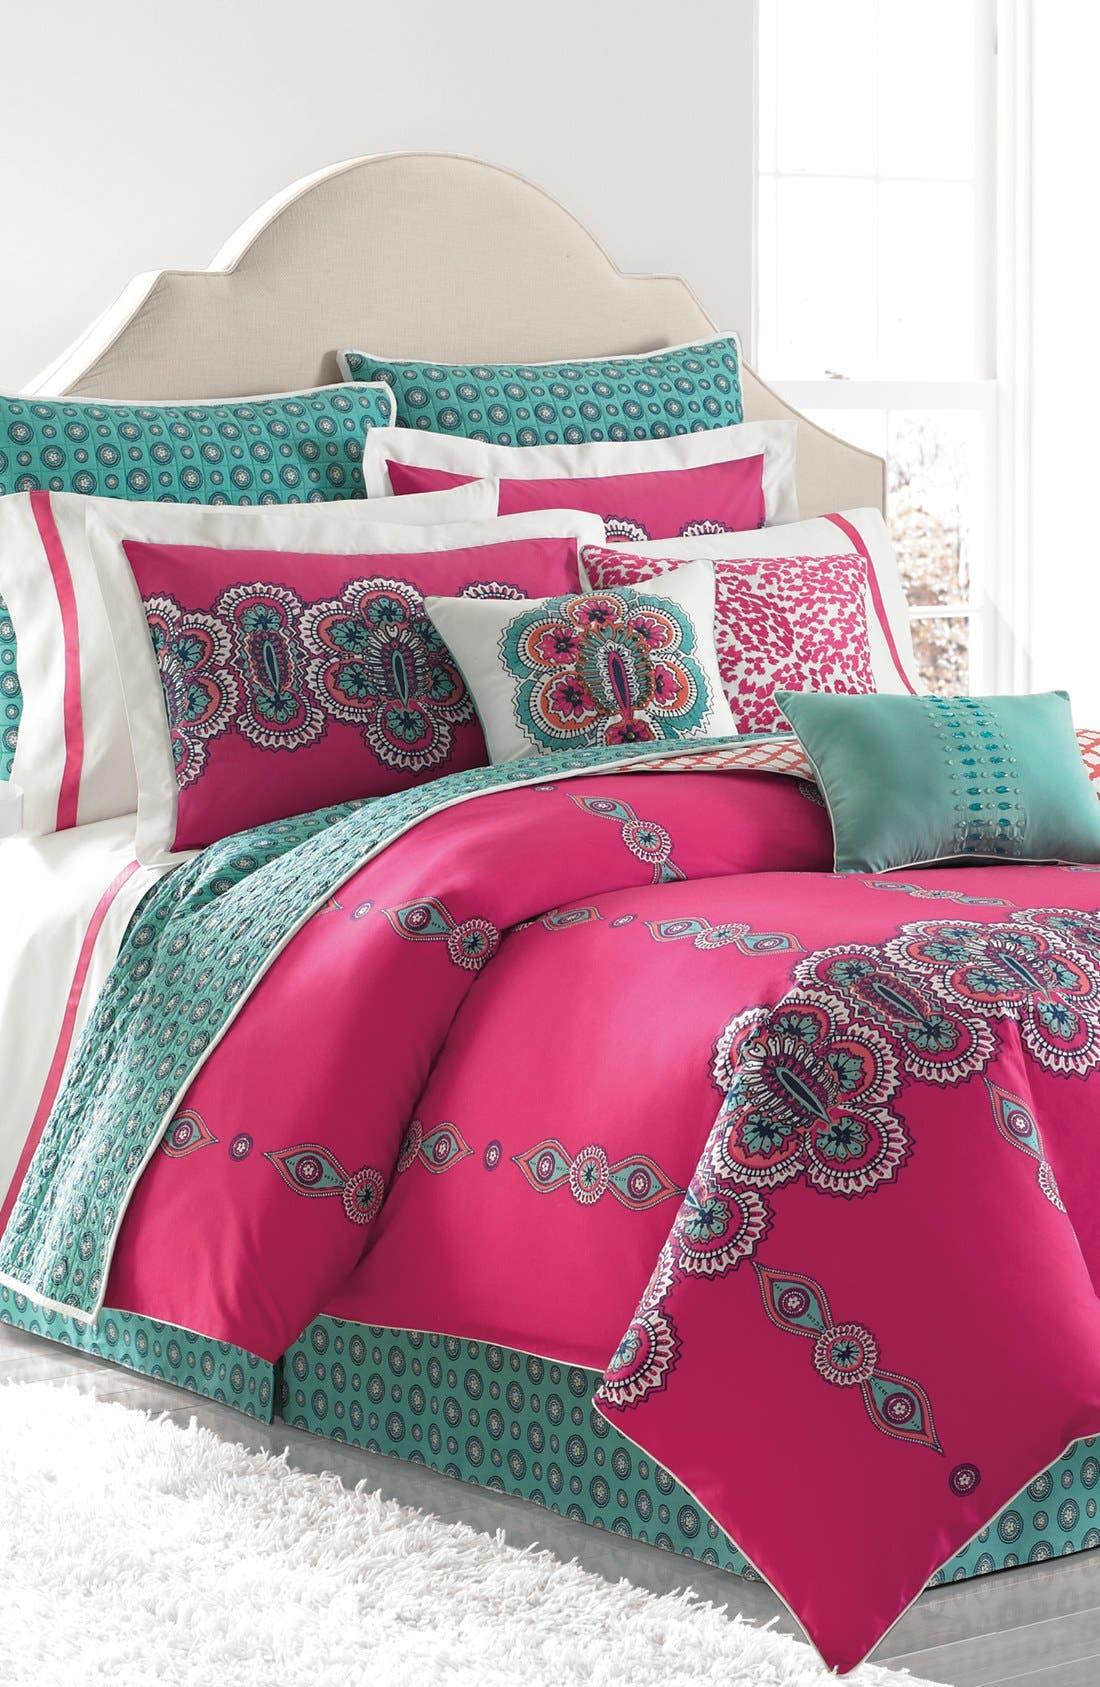 Main Image - Laundry by Shelli Segal 'Shiva' Duvet Cover